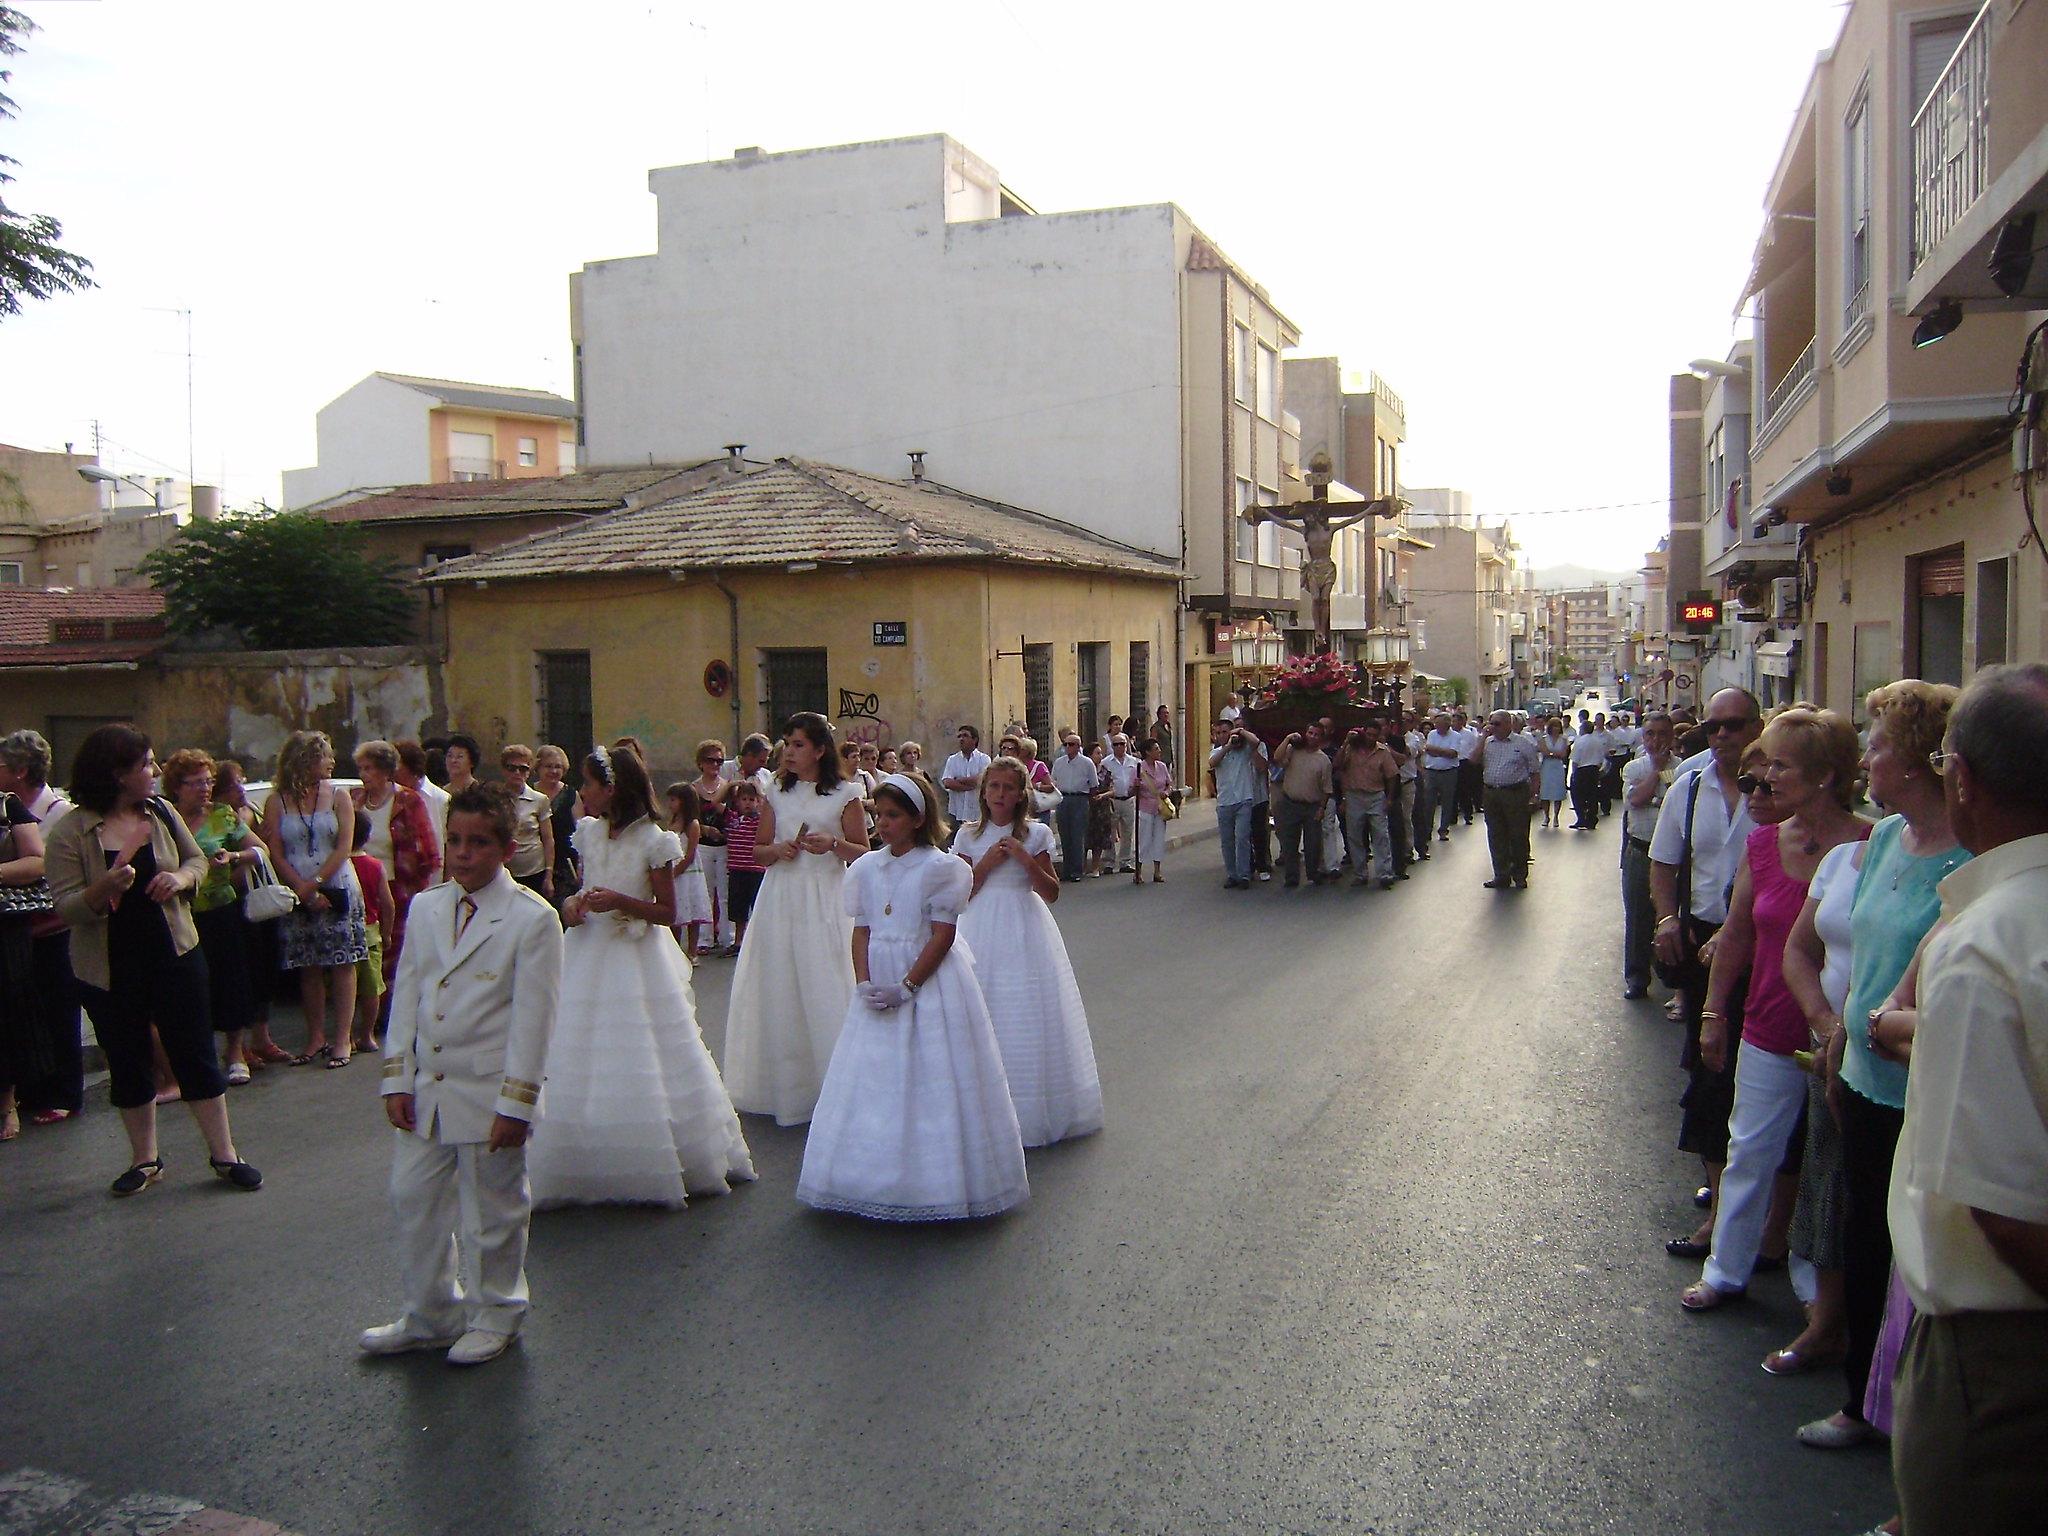 (2009-07-05) - Procesión Subida - Javier Romero Ripoll - (11)